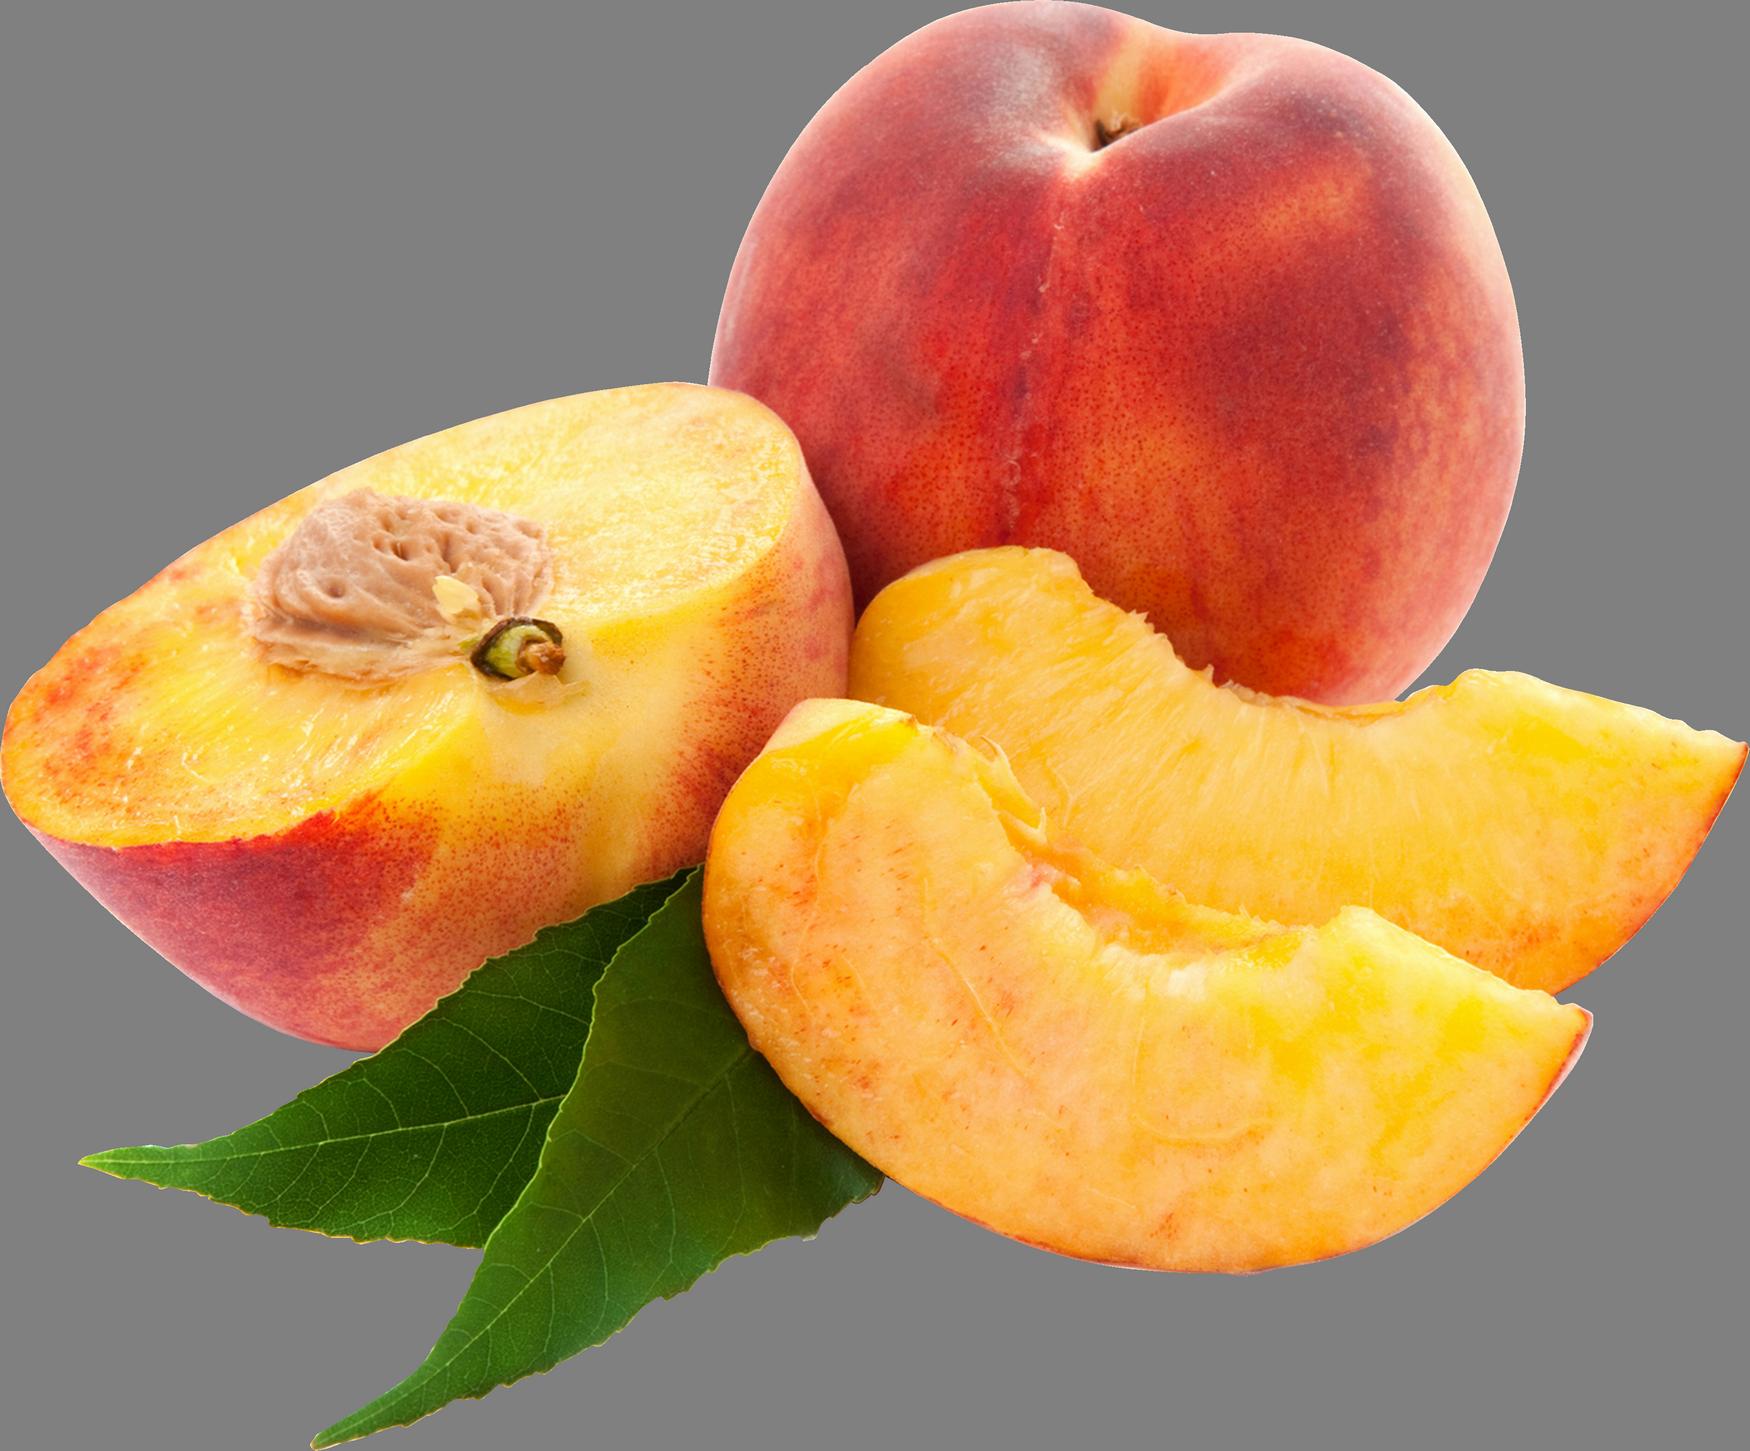 Png image purepng free. Peach clipart orange food